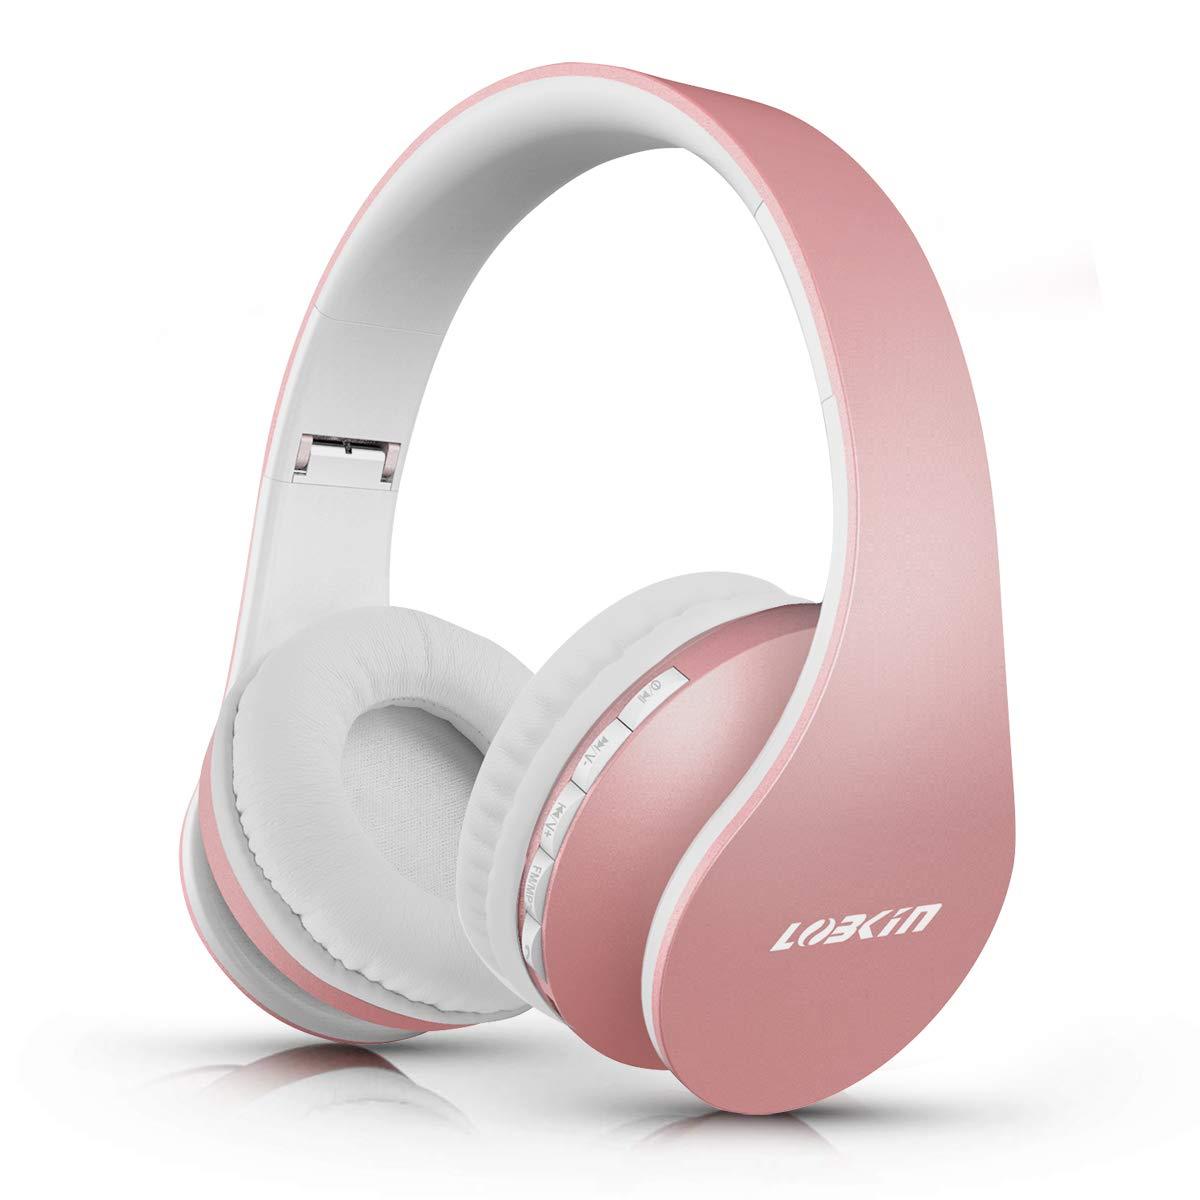 LOBKIN Bluetooth Kopfhörer, Over Ear Faltbare Headsets, Kabellos Stereo Kopfhörer mit Integriertem Mikrofon, TF/SD-Karte, FM Radio für iPhone, Android und PC